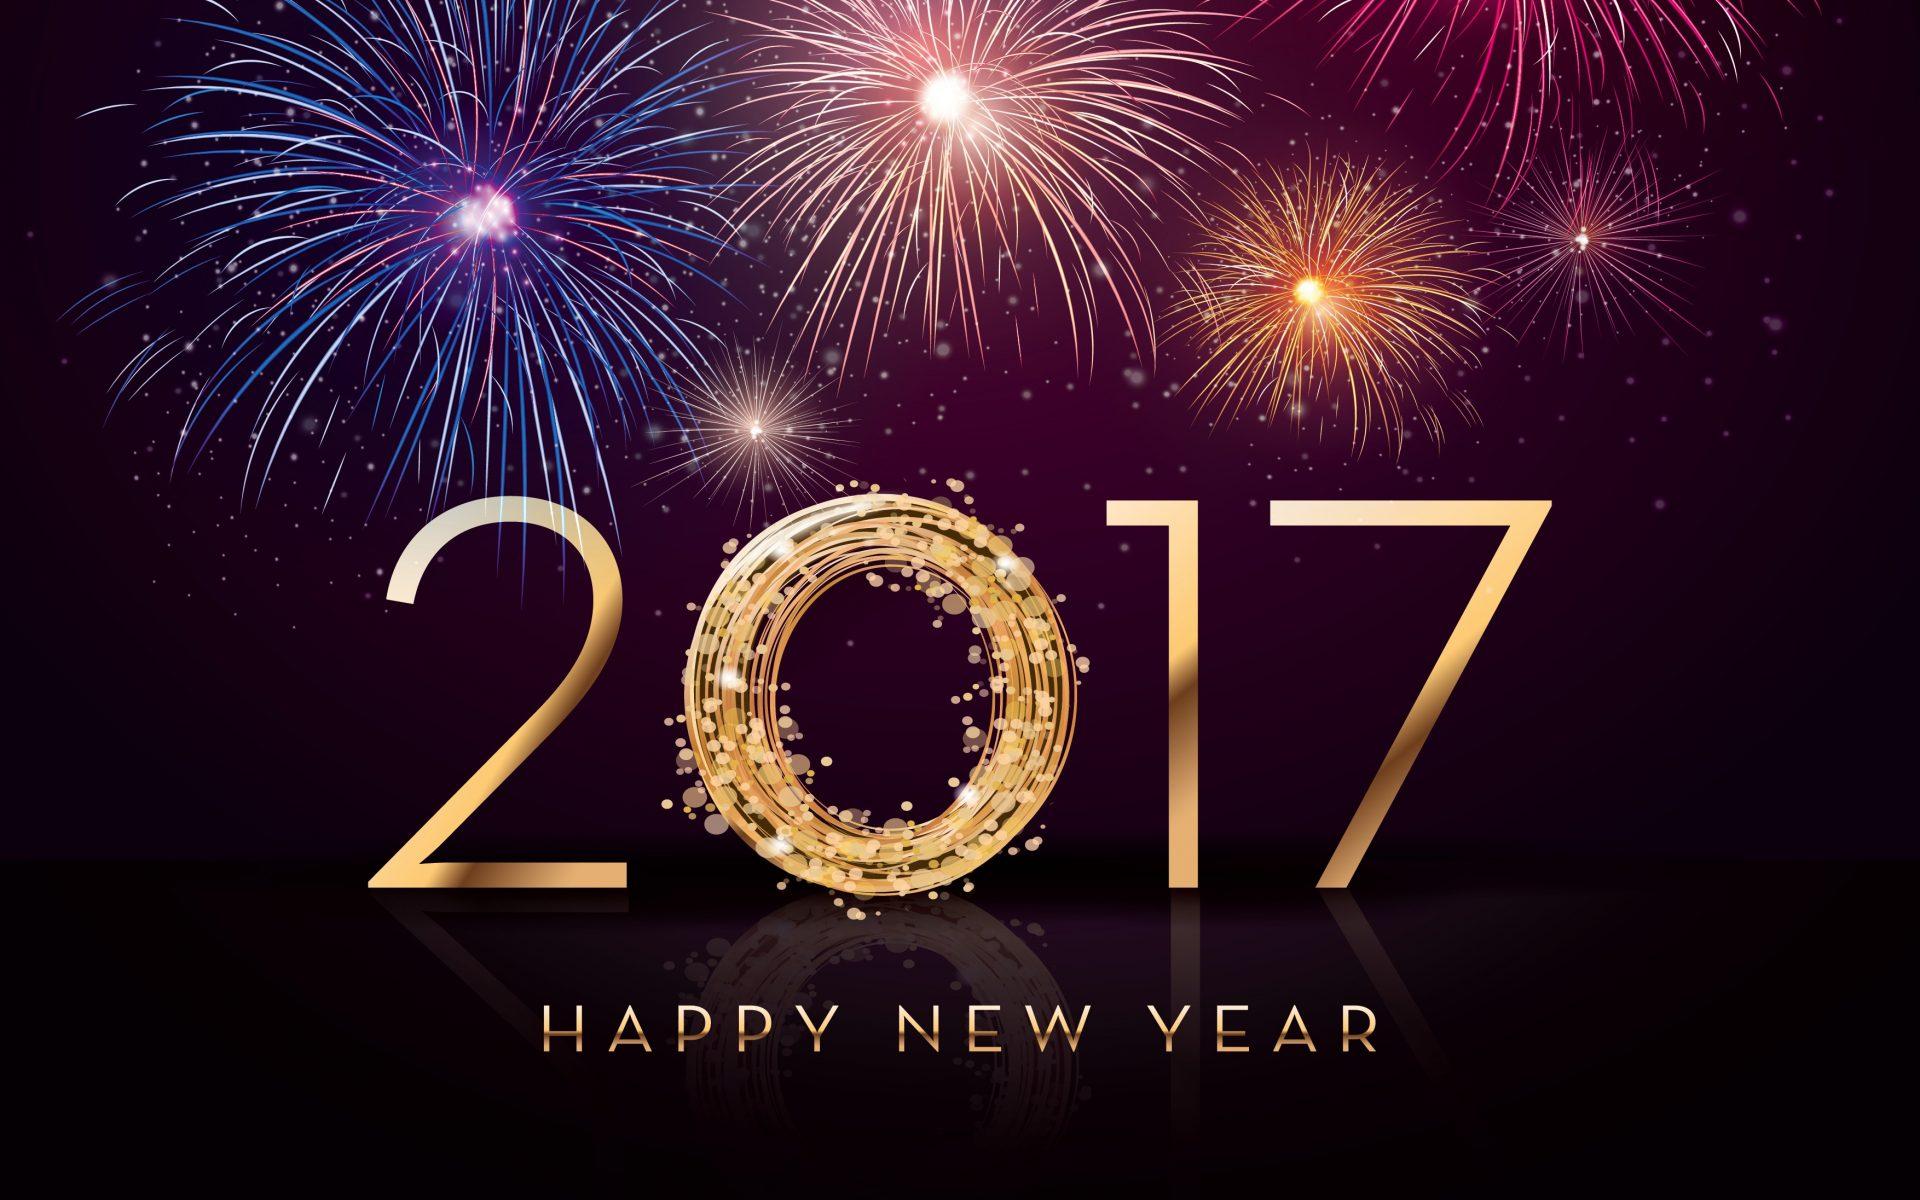 New Year 2017 Greetings Wallpaper